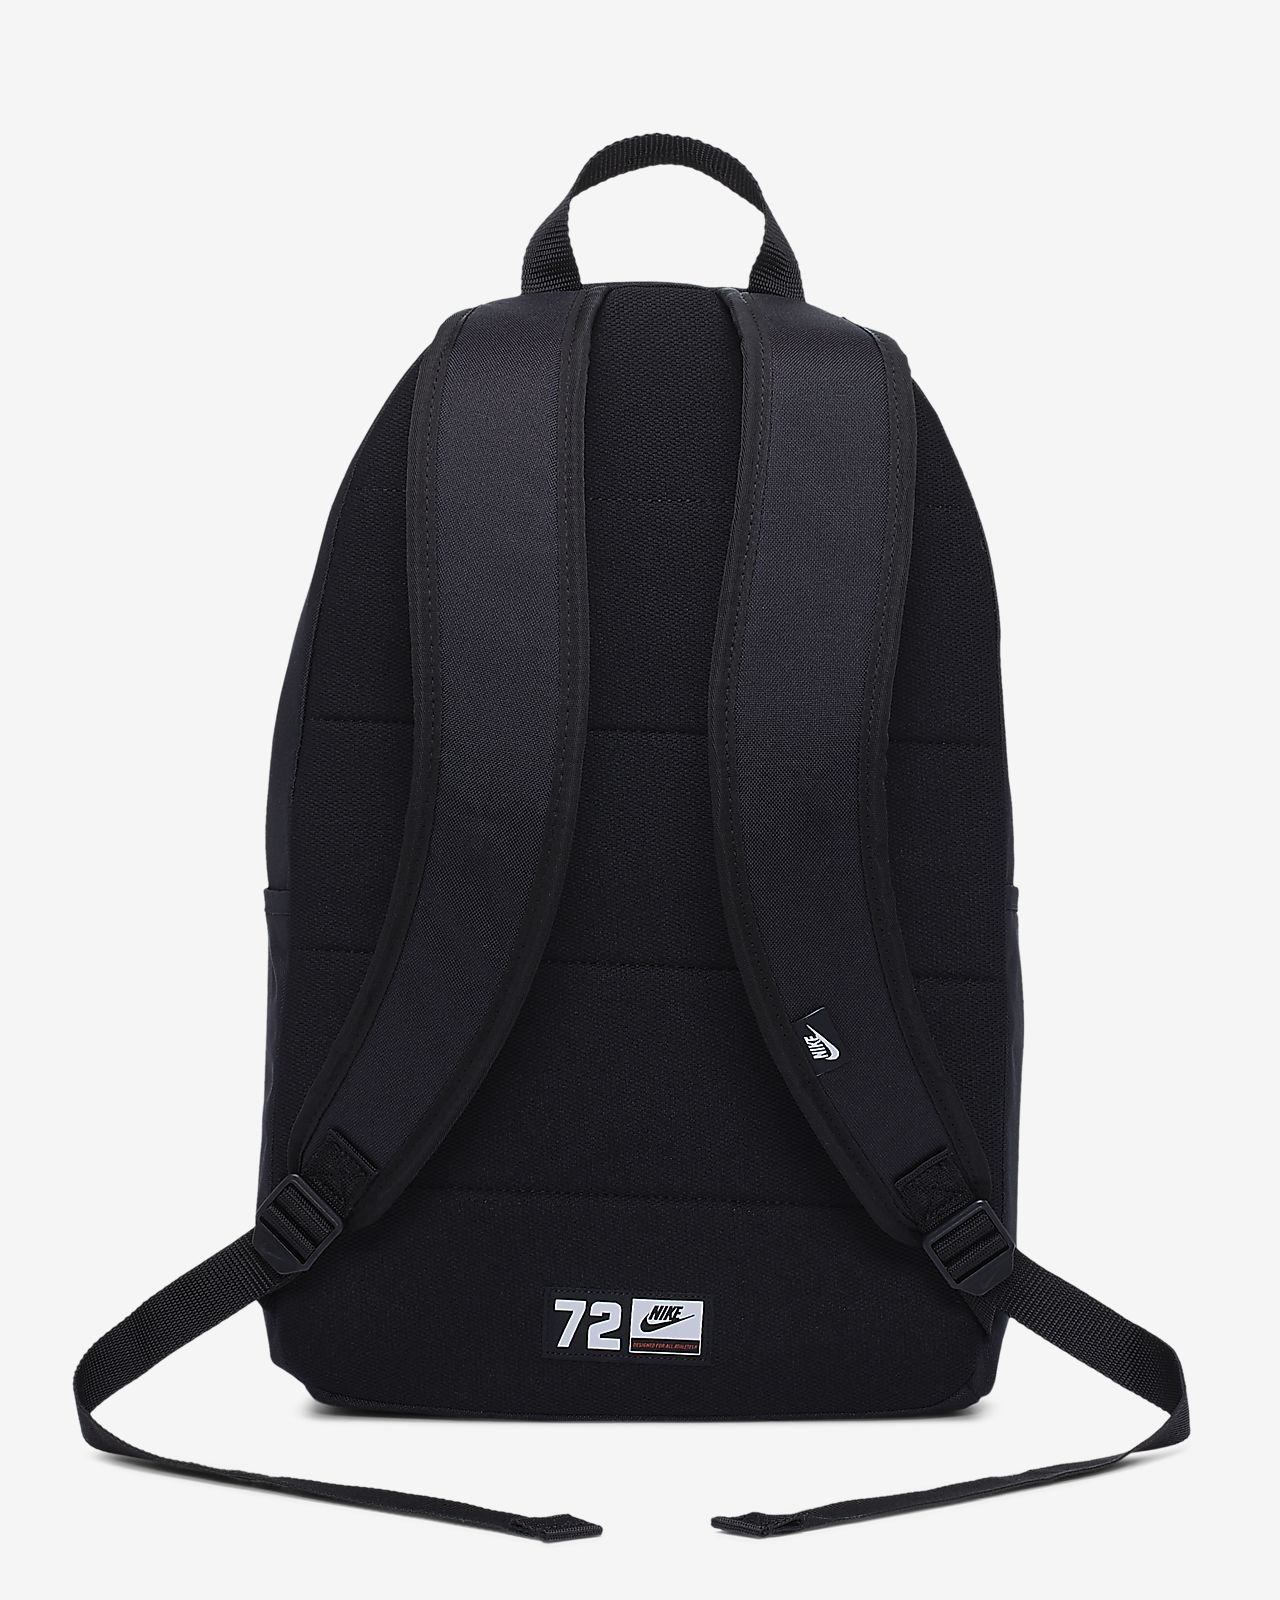 Batoh Nike Elemental LBR